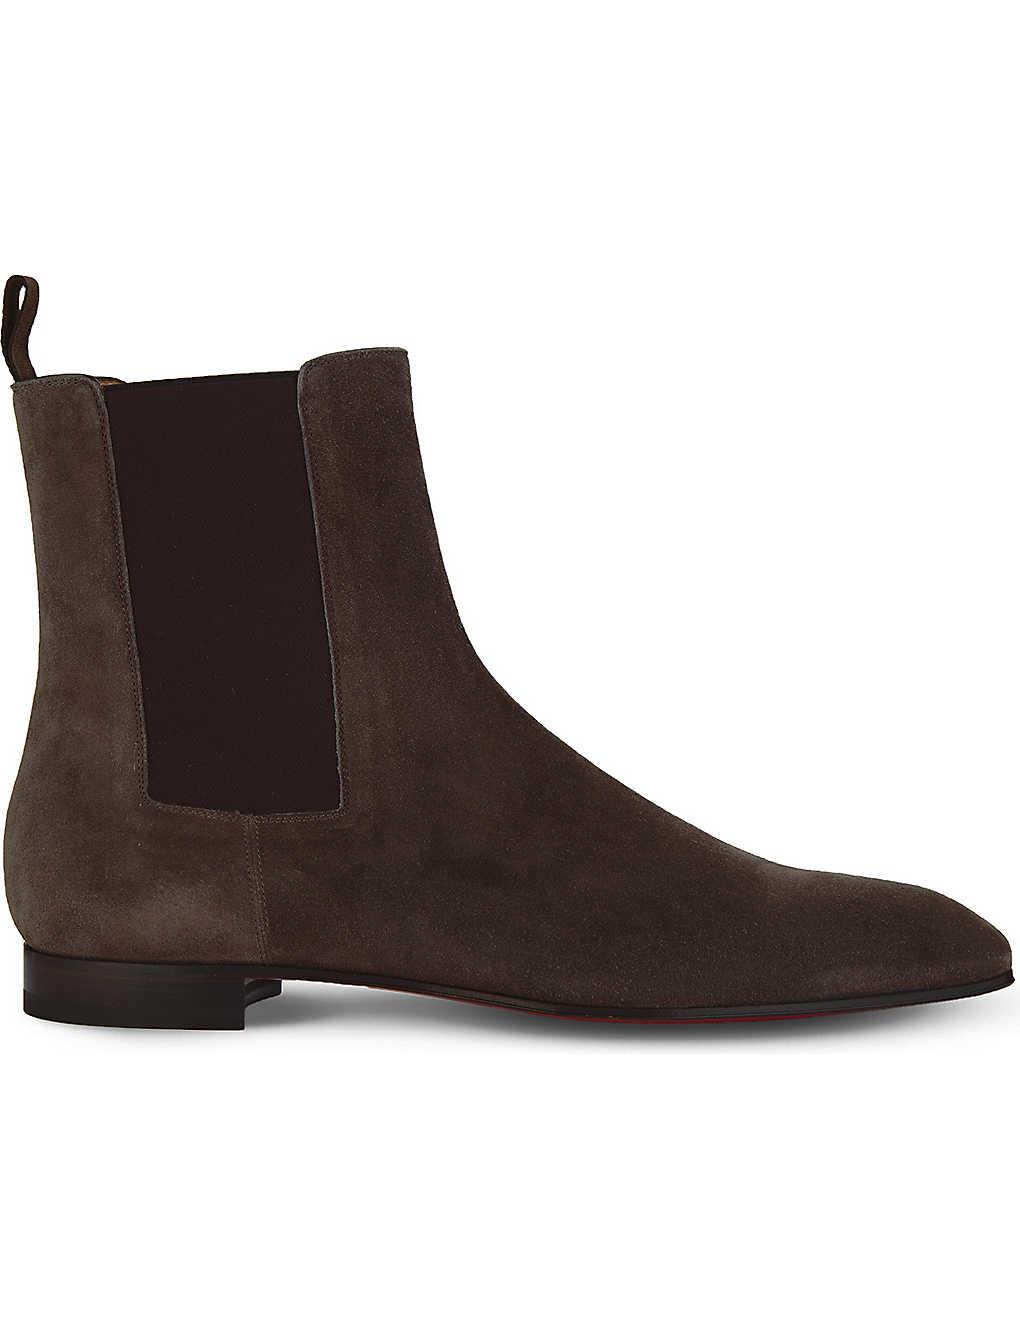 new styles e201c f7010 CHRISTIAN LOUBOUTIN - Roadie flat veau velours | Selfridges.com